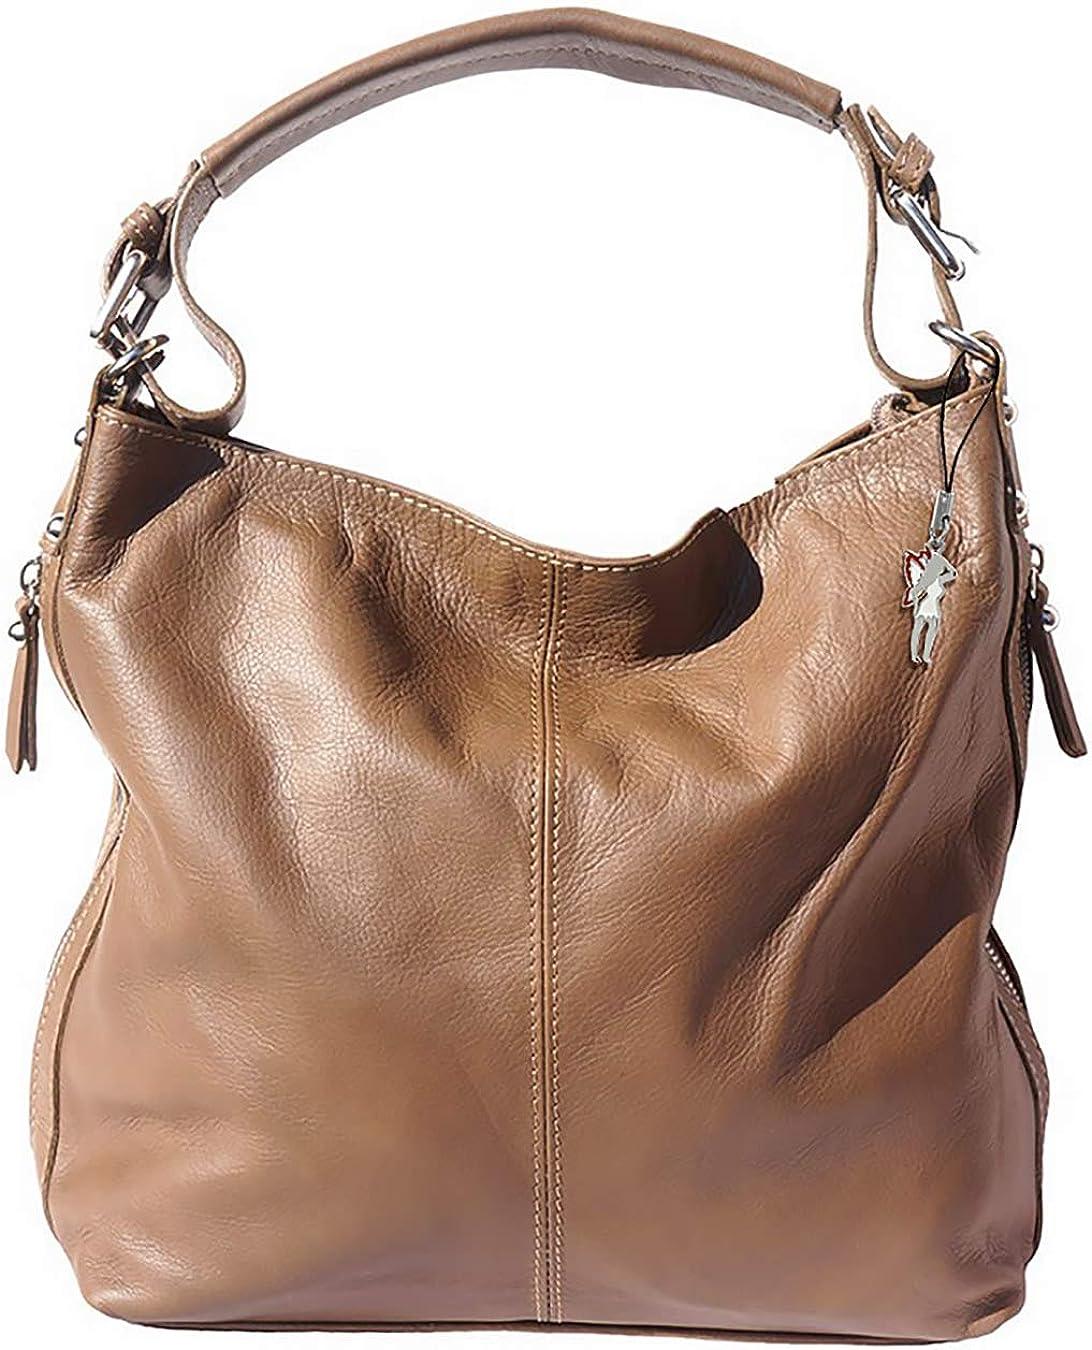 Schultertasche Hobo Bag schwarz Leder Damen Beuteltasche Made in Italy OTF101S